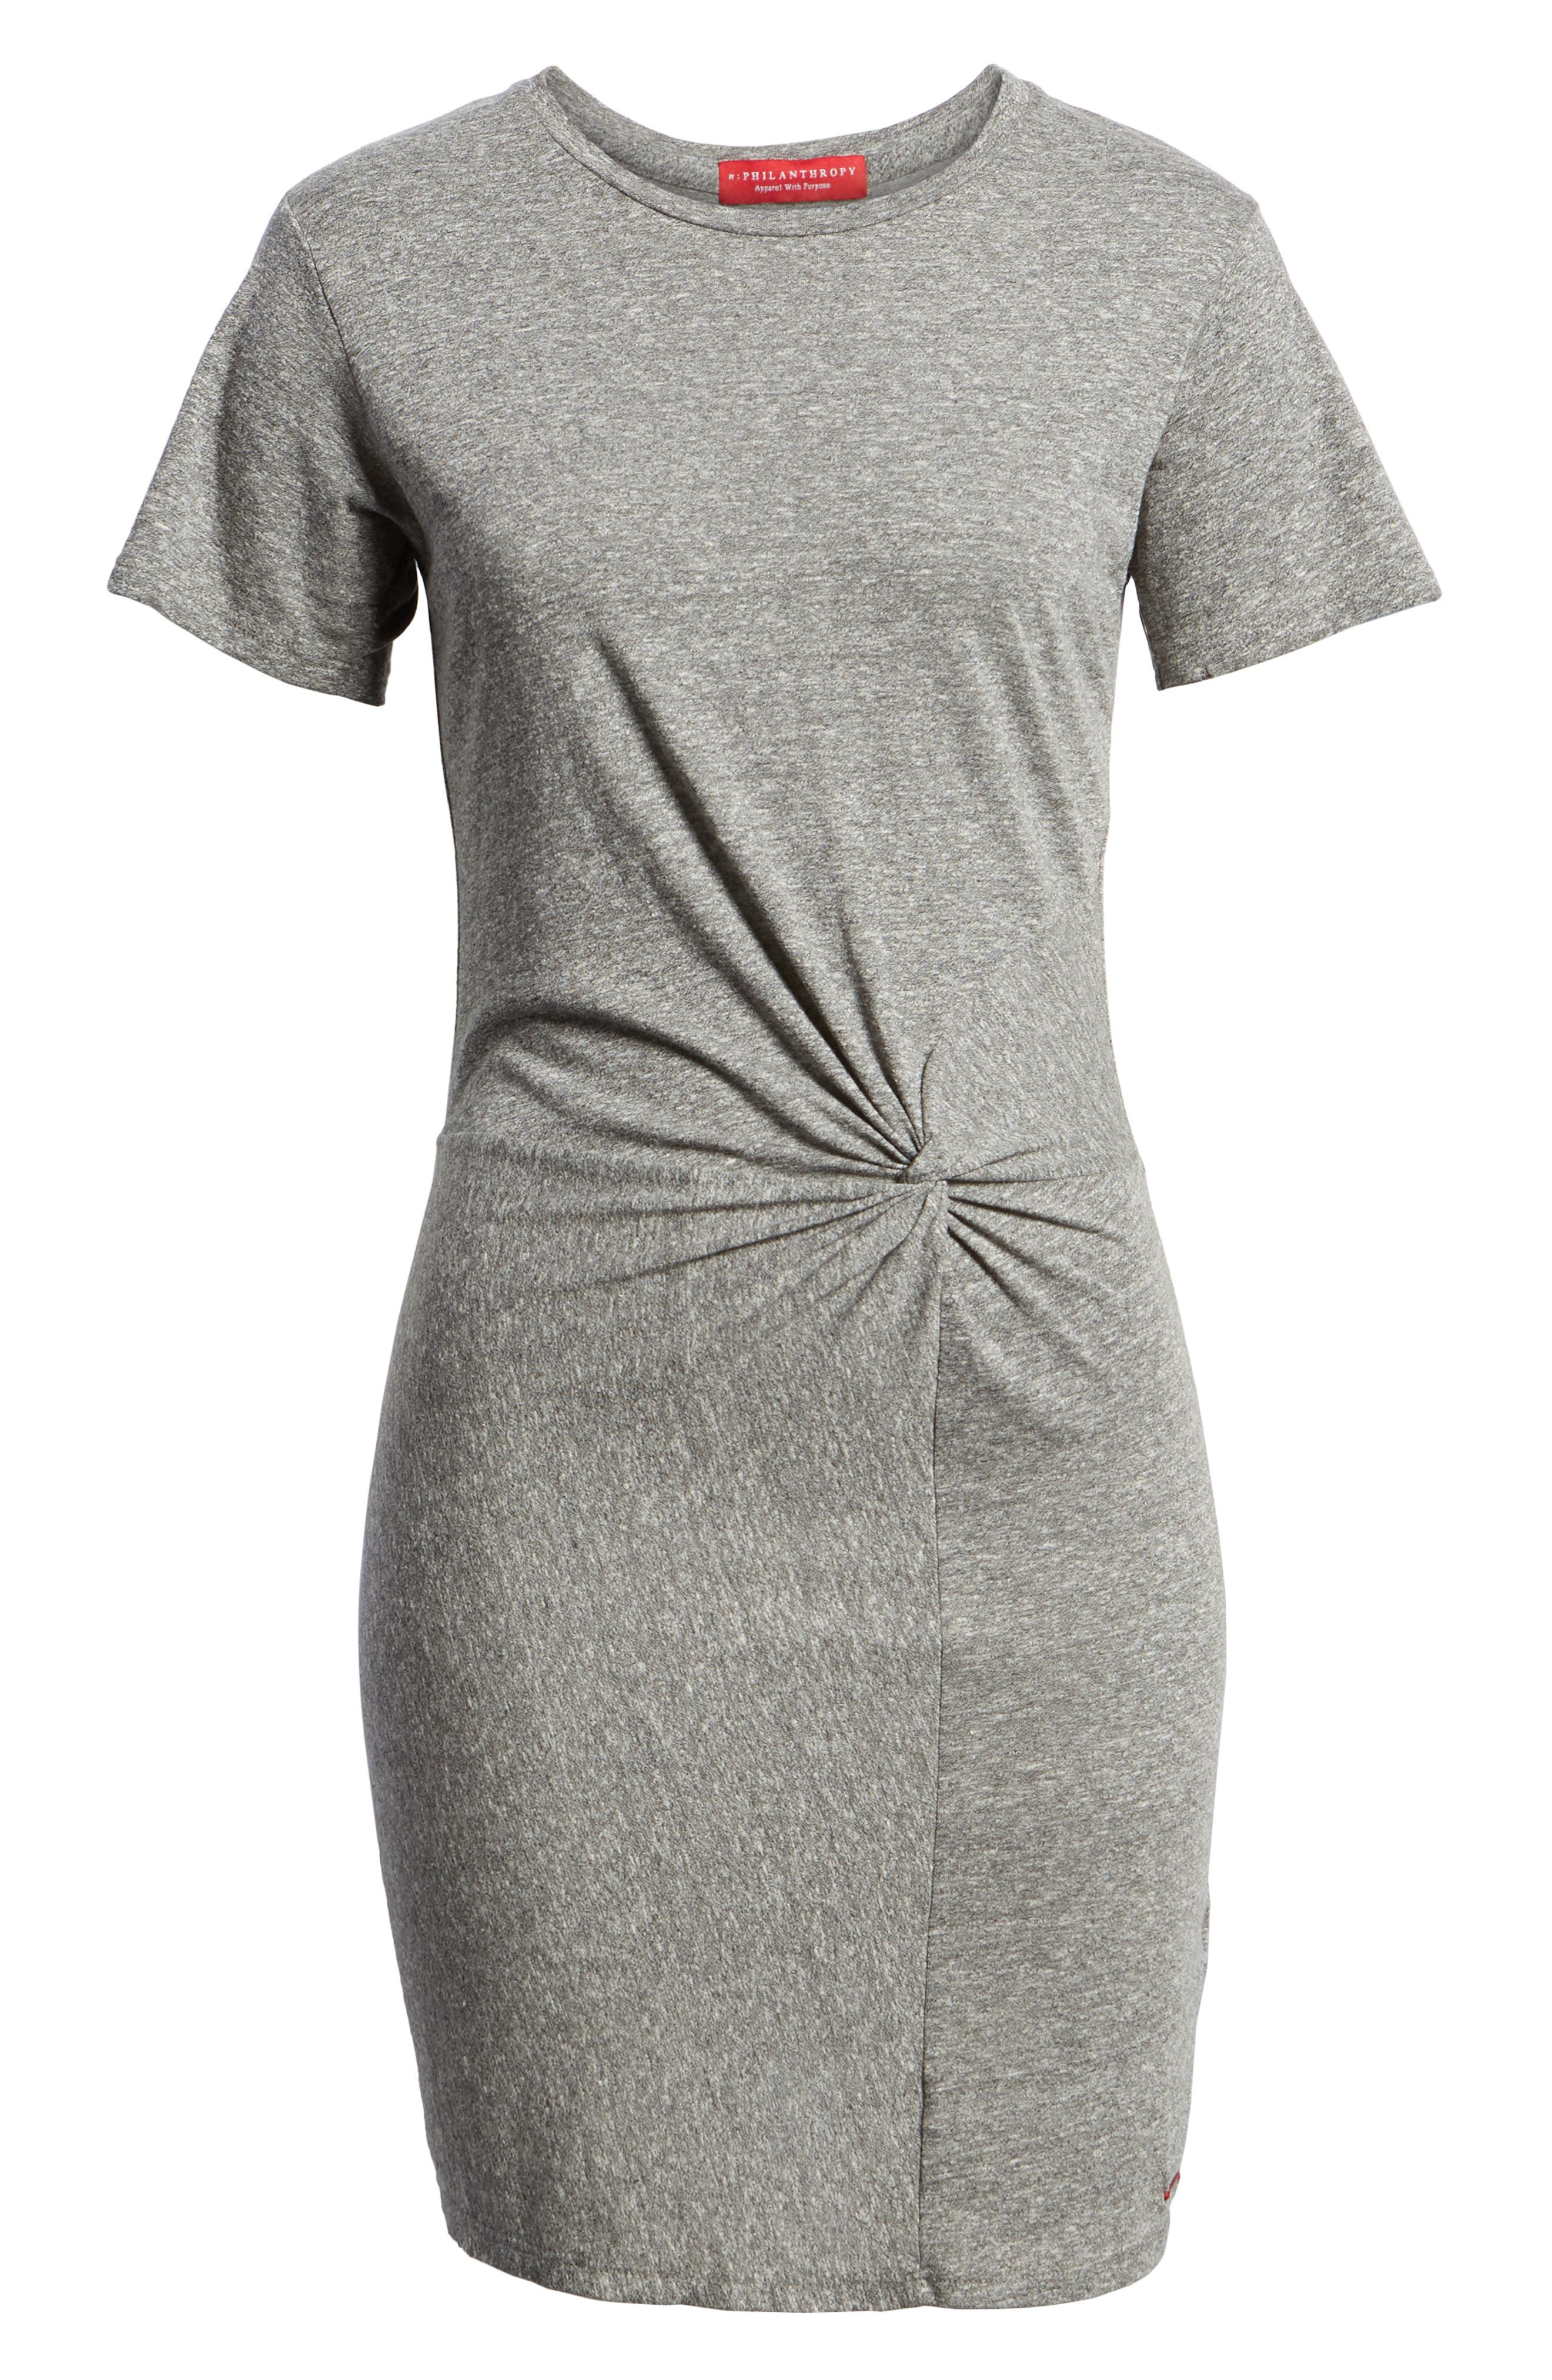 Jazz Twisted T-Shirt Dress,                             Alternate thumbnail 6, color,                             HEATHER GREY